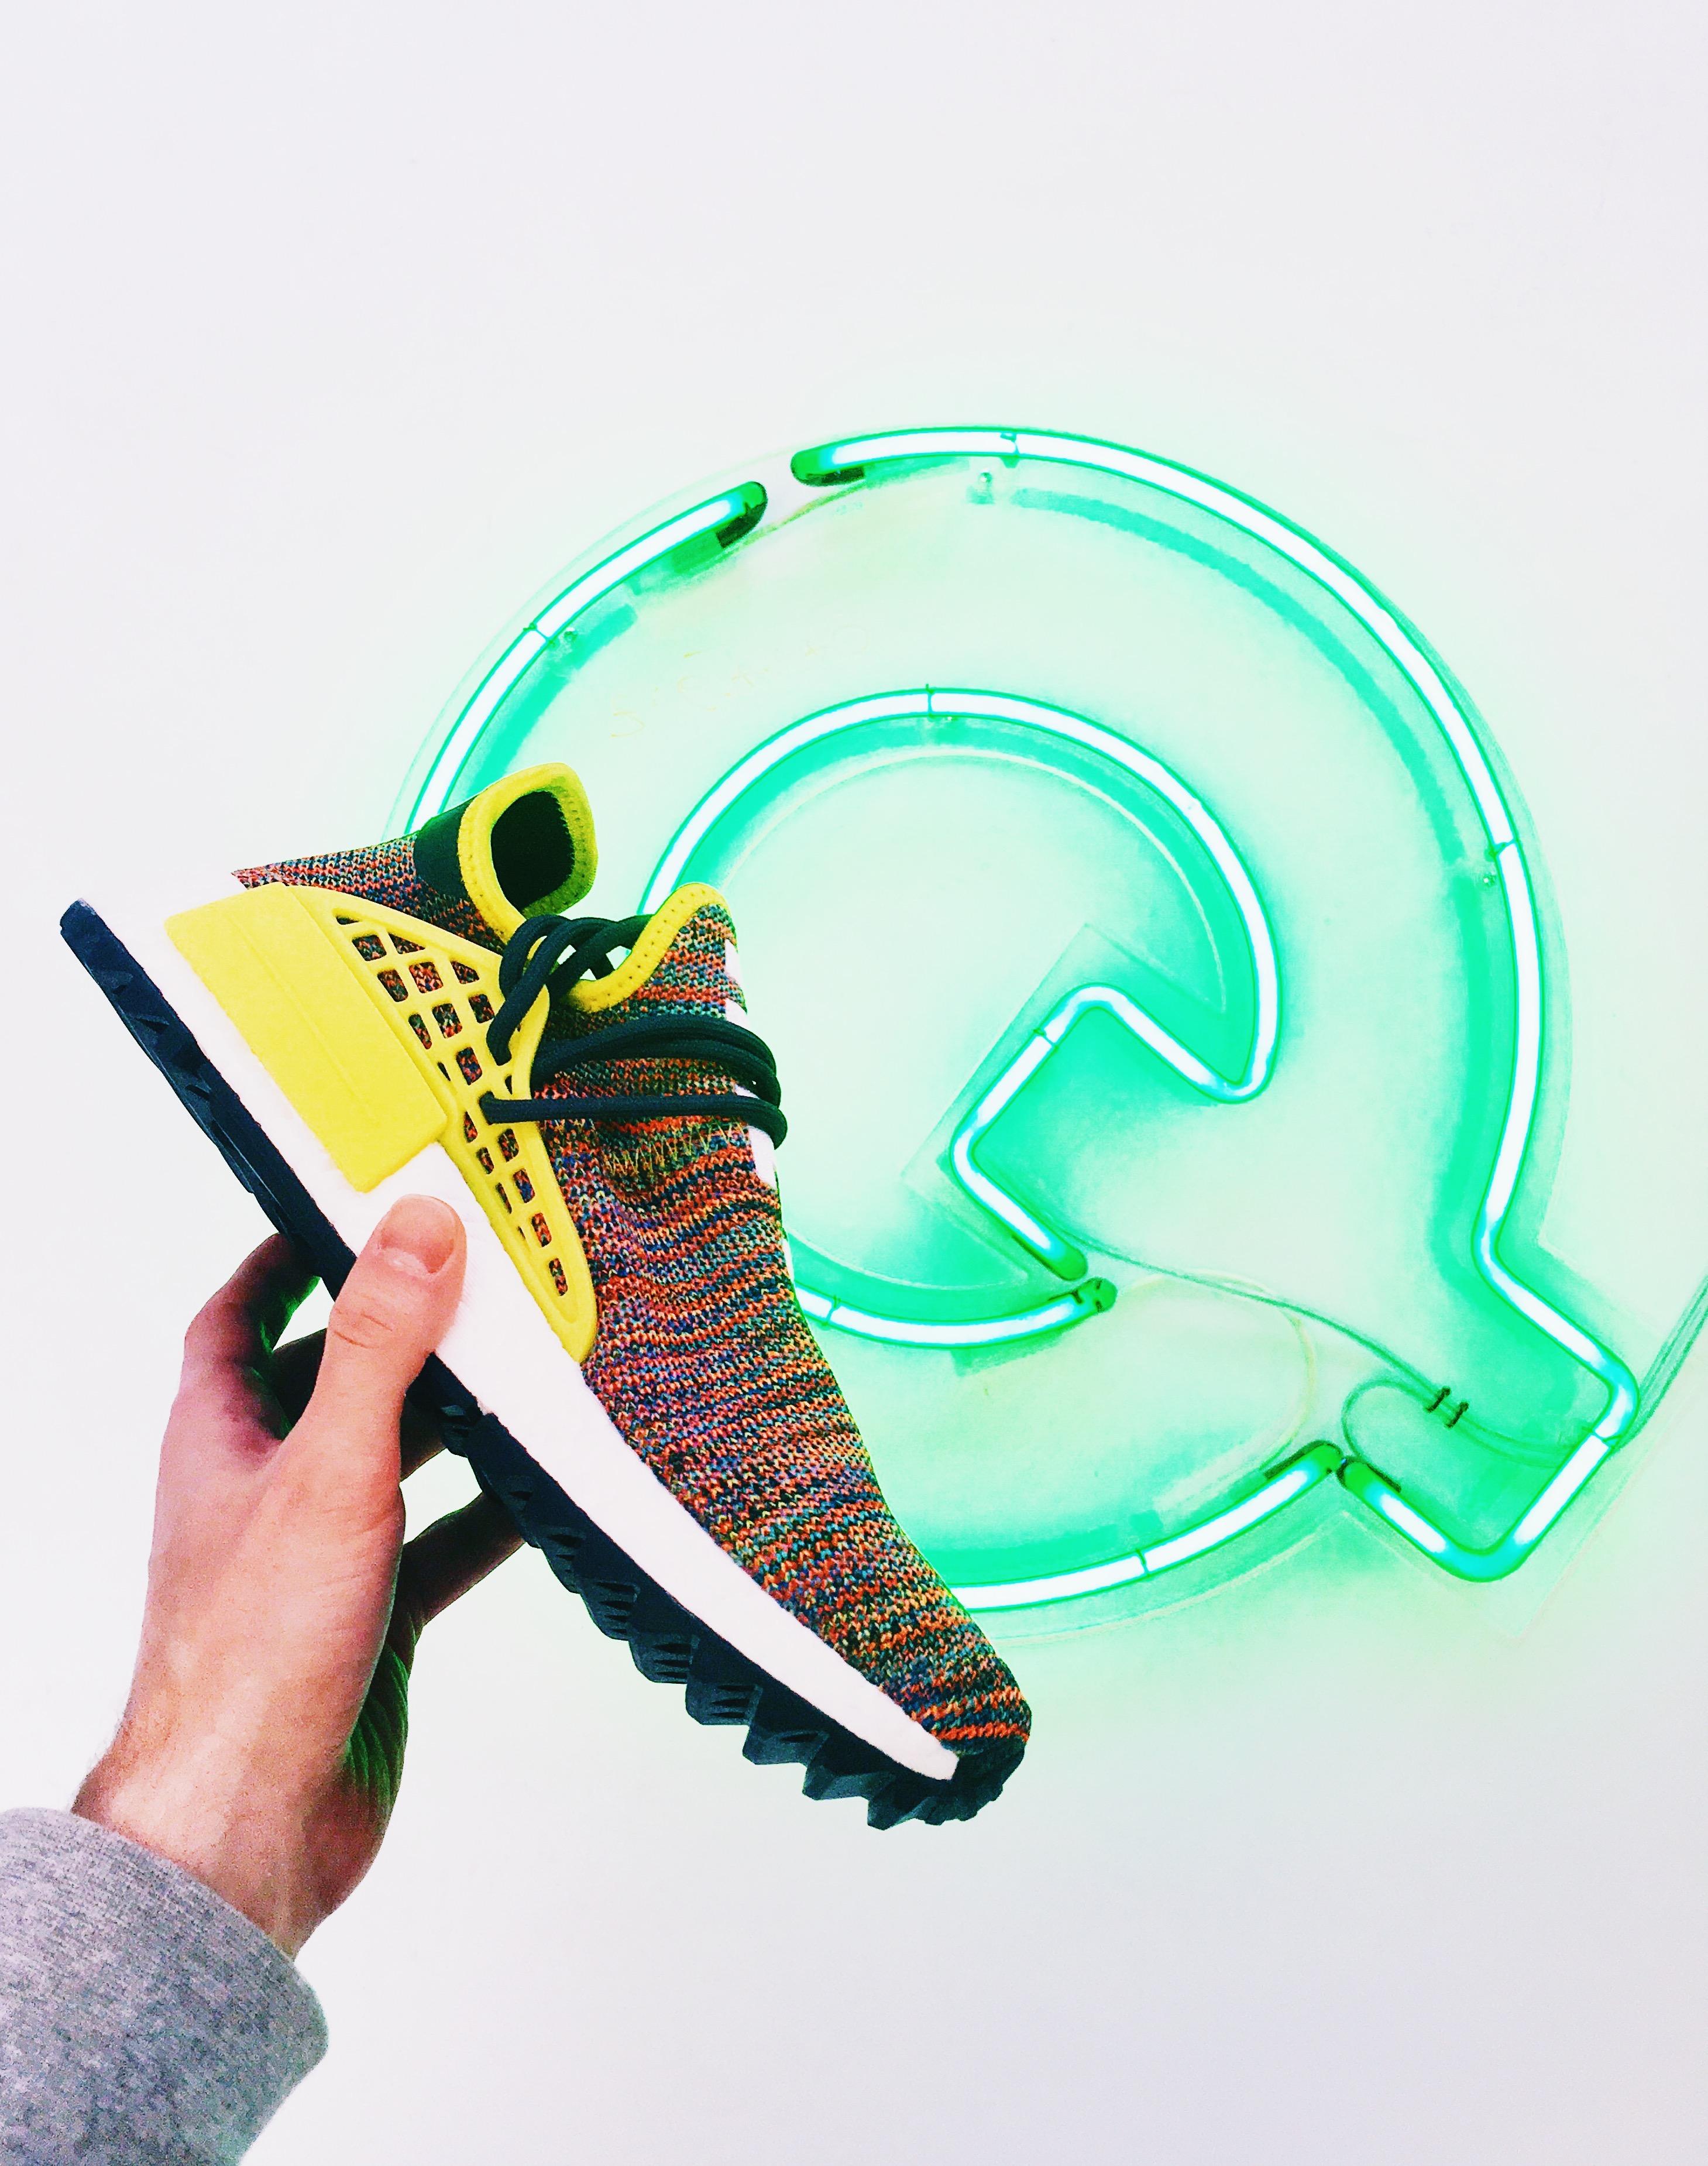 Soutěž o adidas Pharrell Williams HU zadarmo